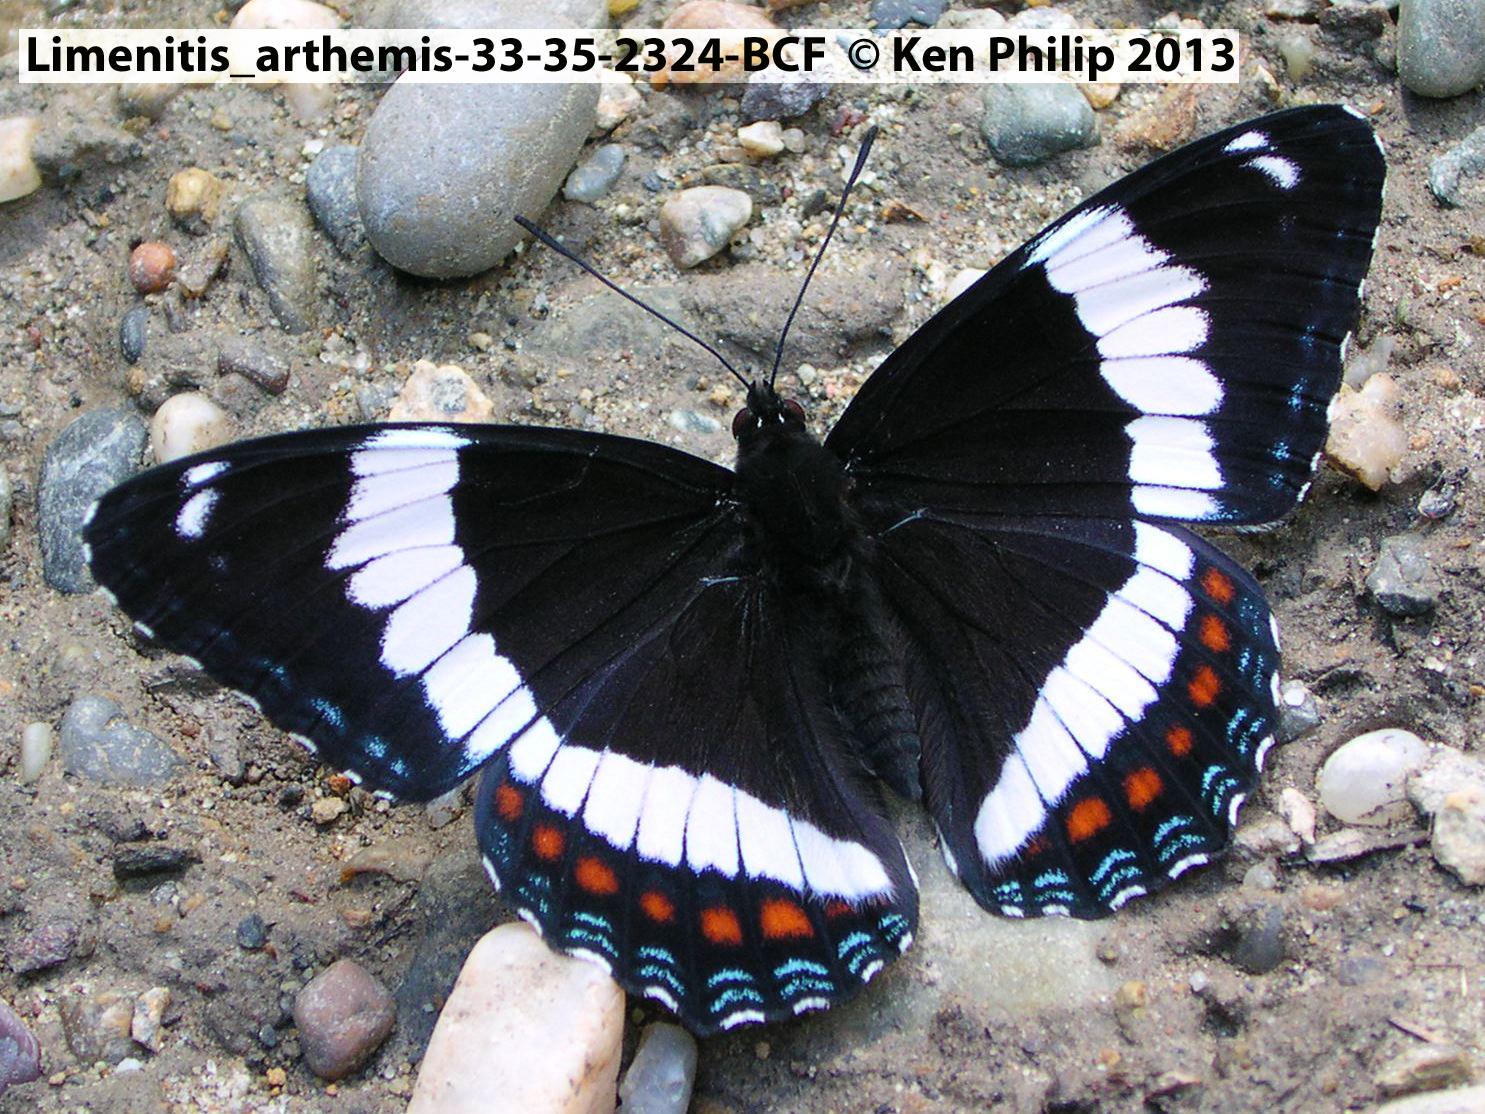 36-Limenitis_arthemis-33-35-2324-BCF